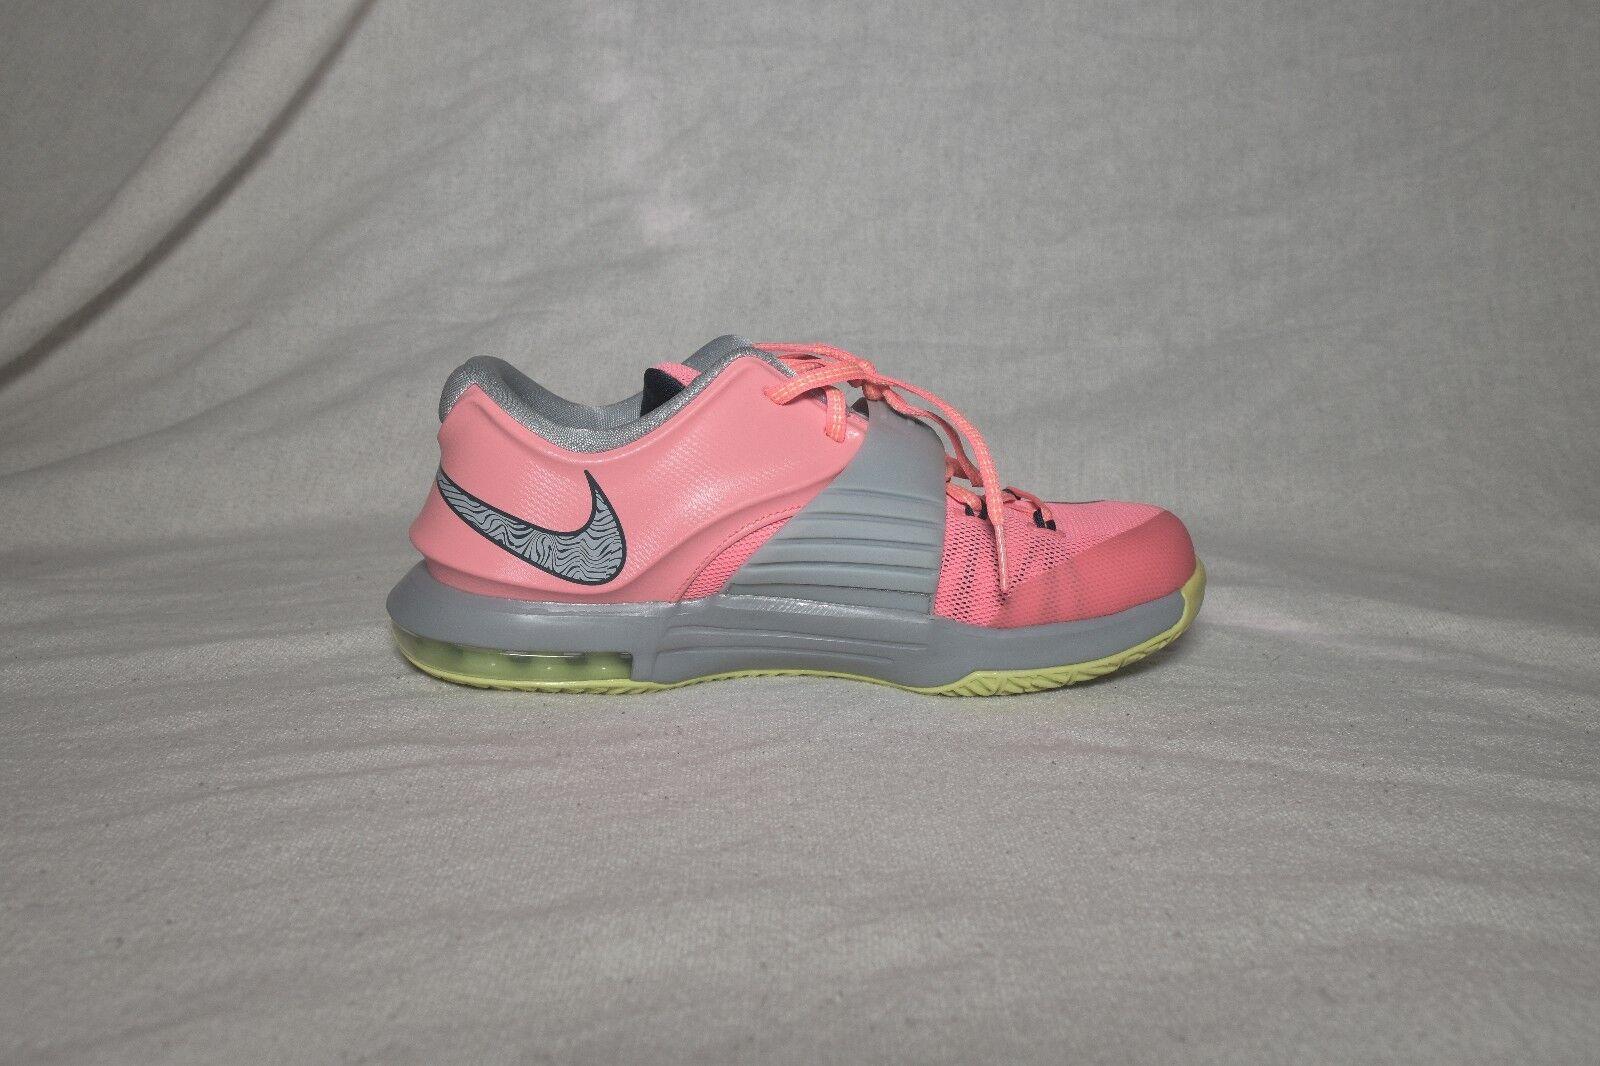 super popular 7f07b d38dc ... Nike Air KD KD KD 7 VI 35000 Degrees Pink Grey Volt Neon Sneakers  Women s Size ...